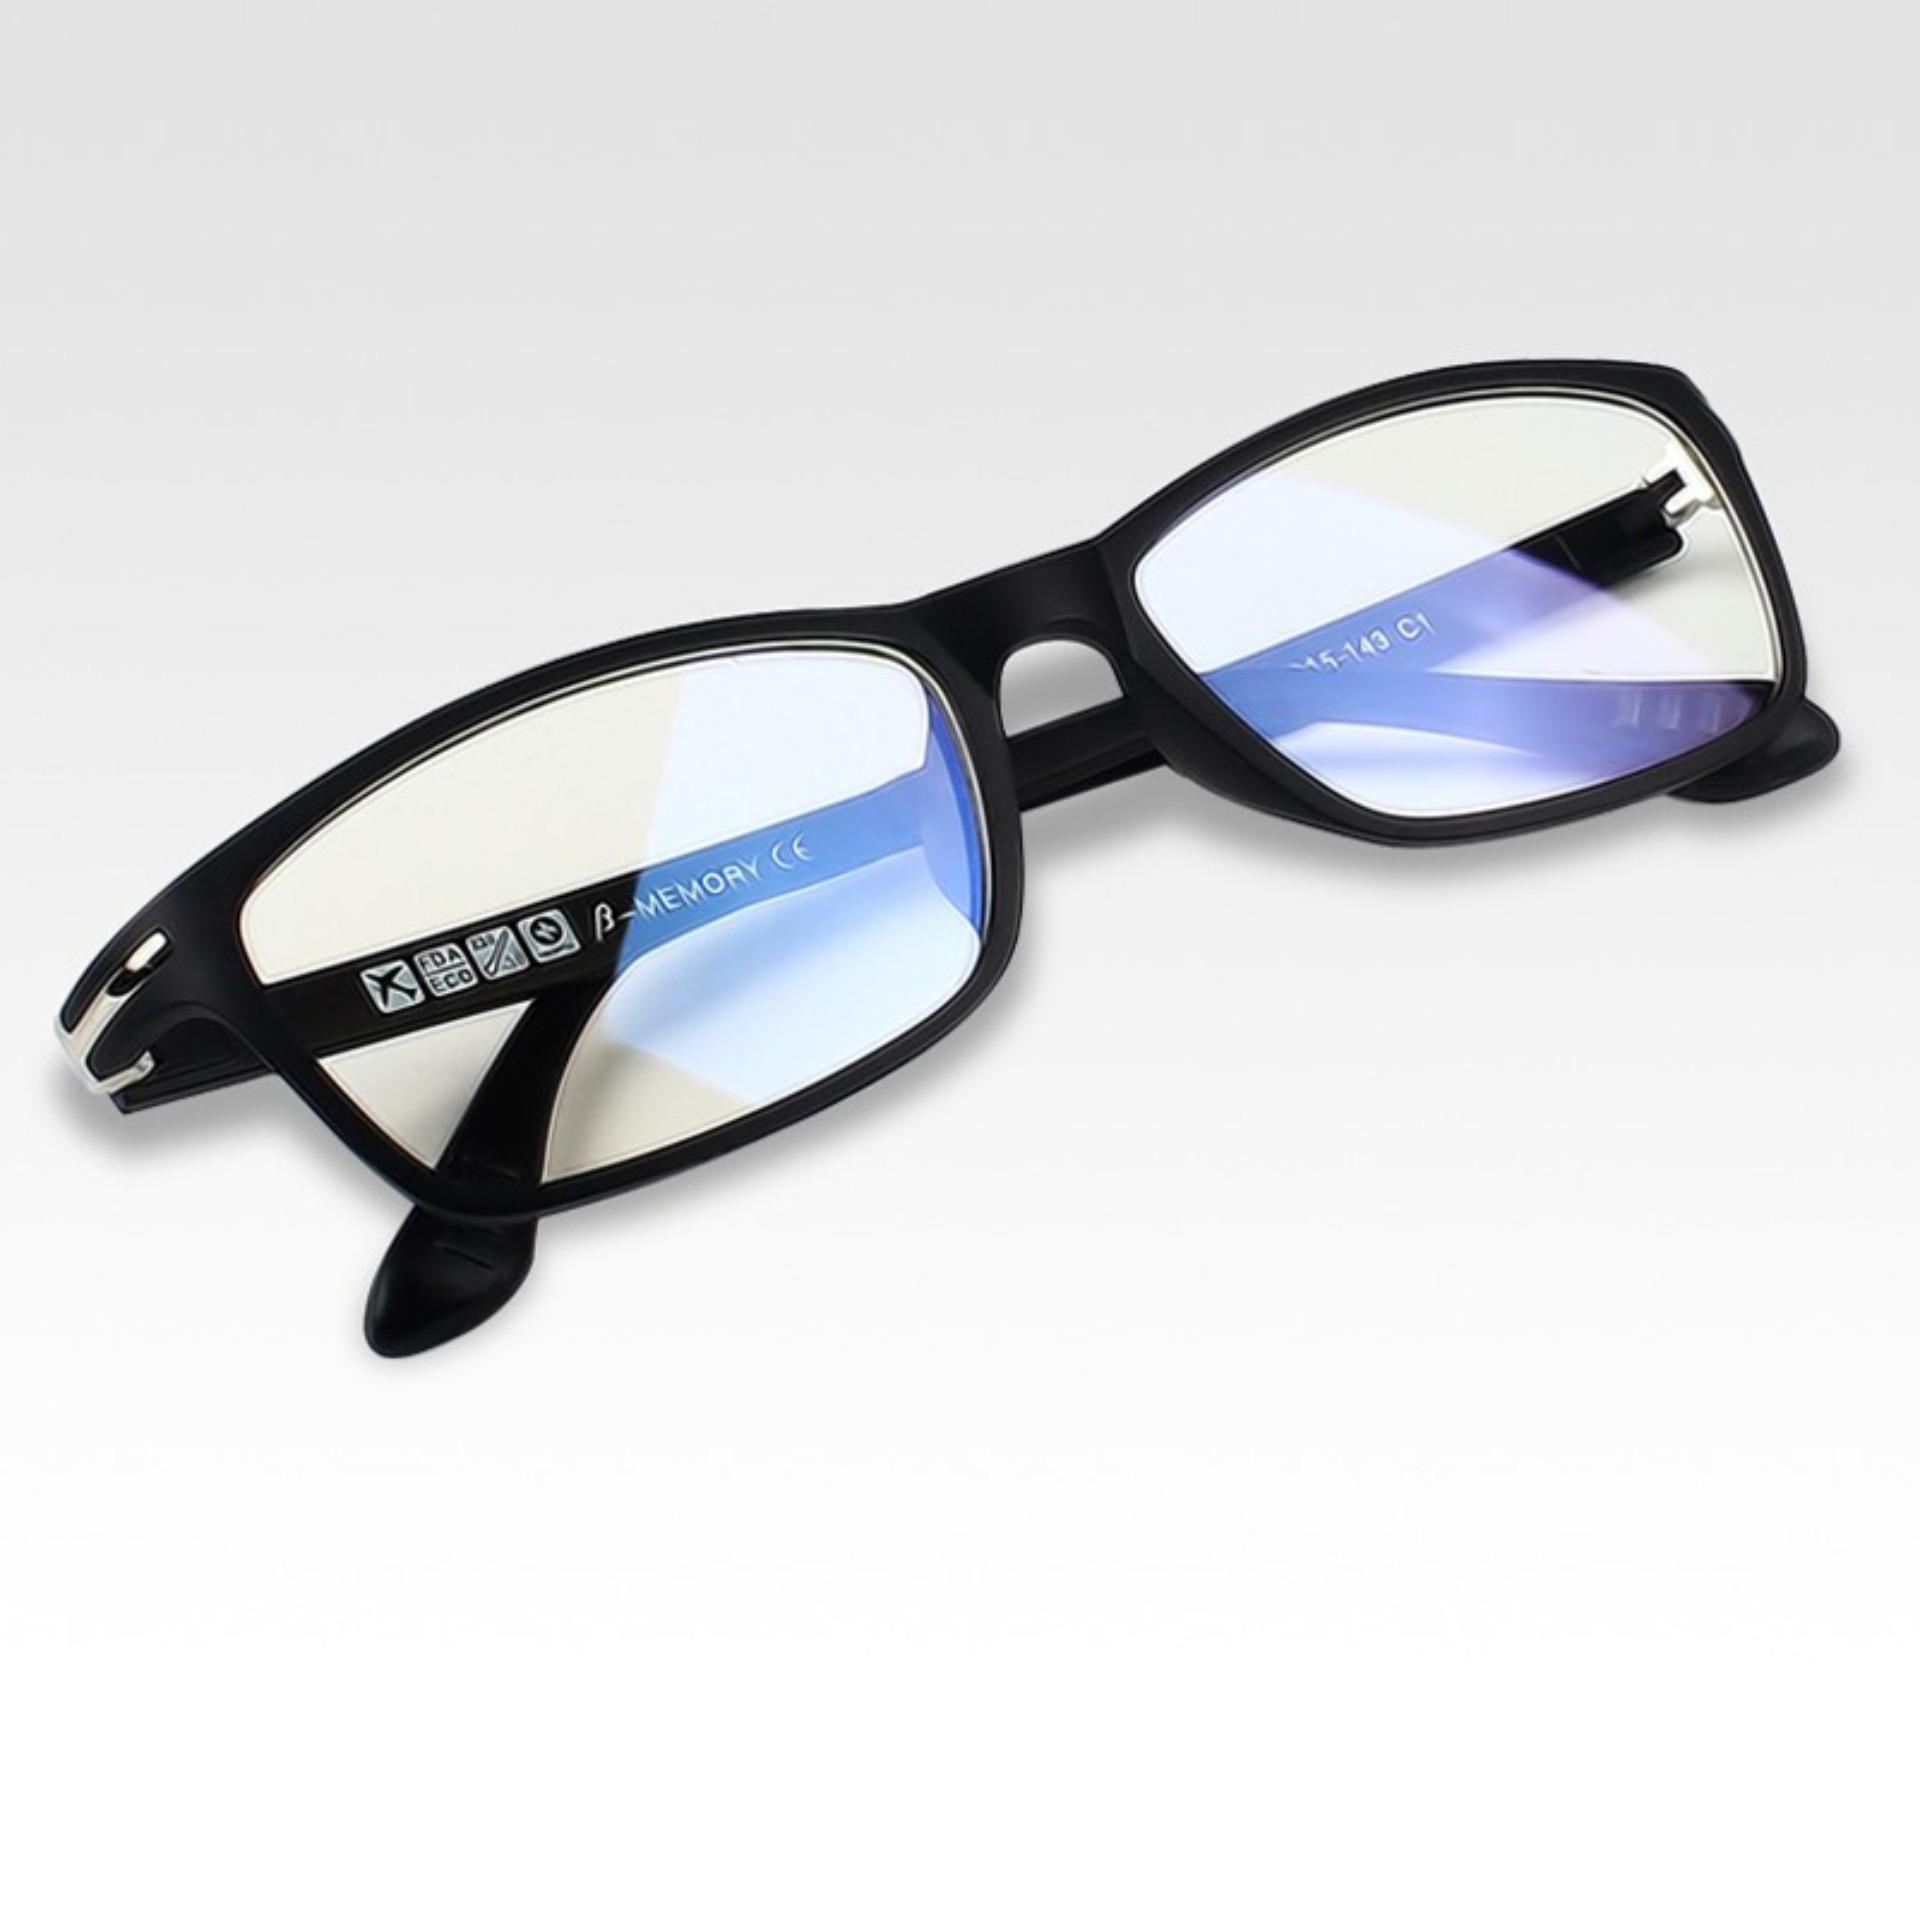 KATELUO Tungsten Computer Goggles Anti Fatigue Radiation-resistant Glasses Frame Eyeglasses 13025 | Lazada PH